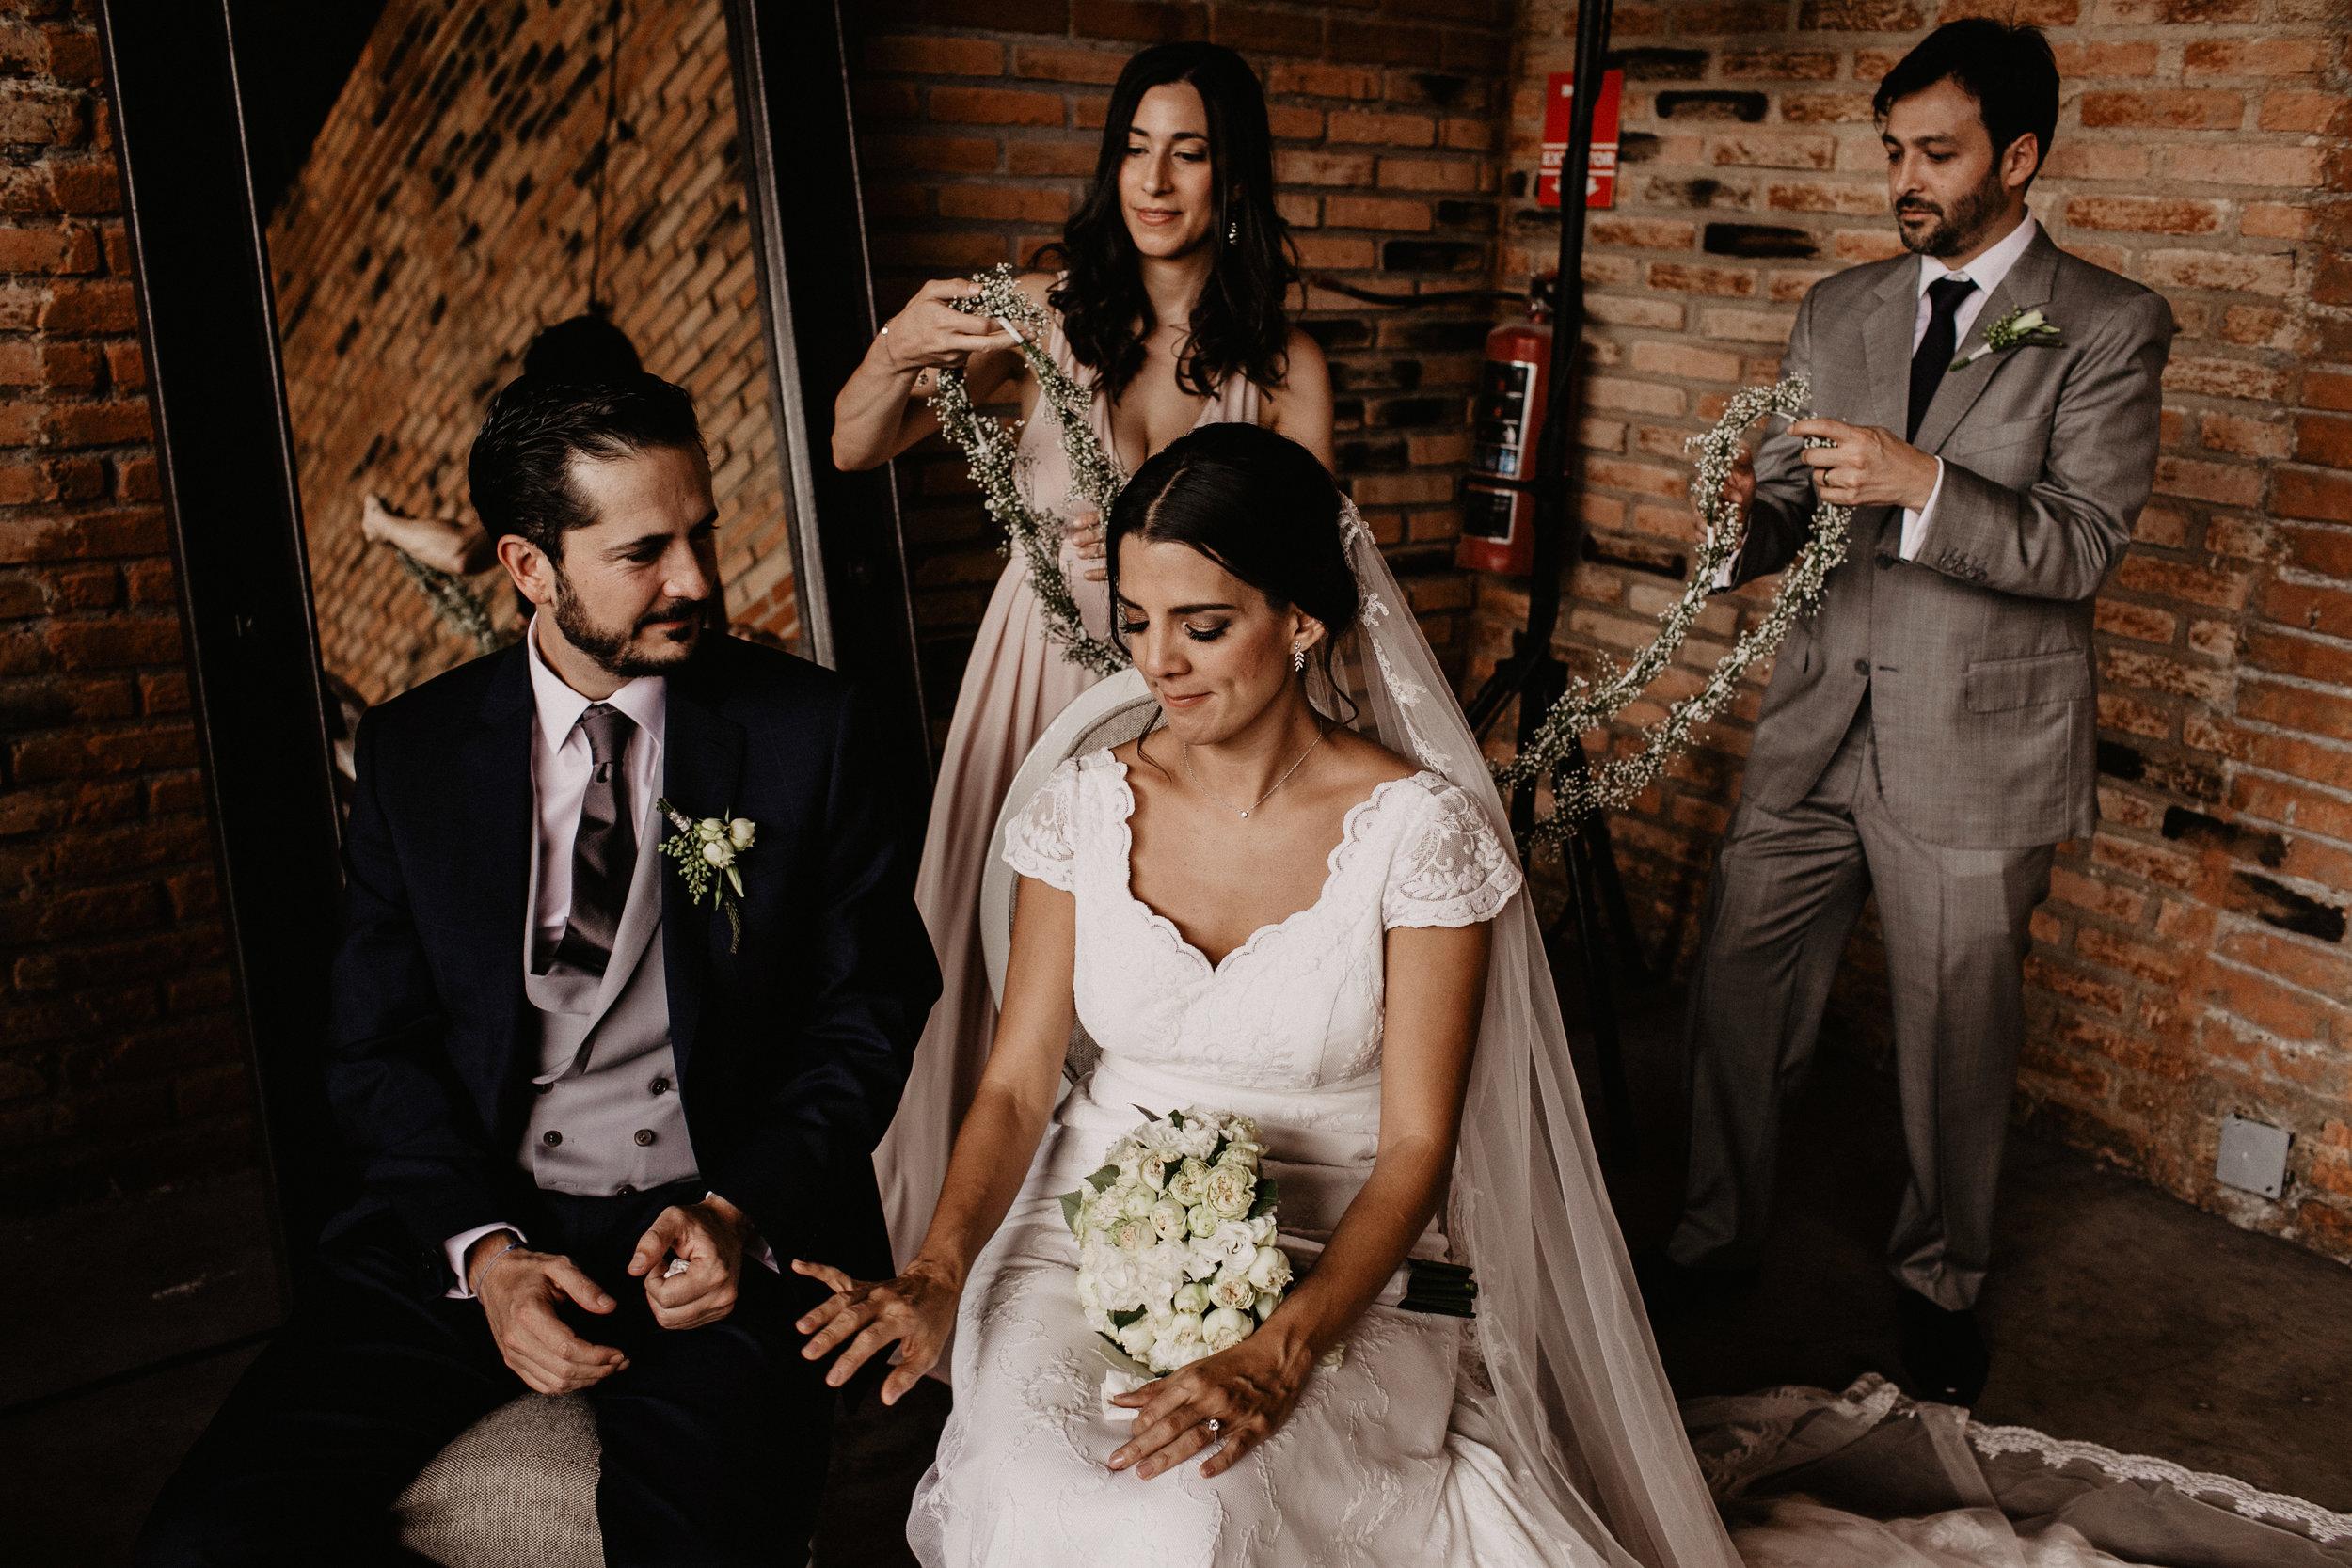 alfonso_flores_destination_wedding_photographer_pau_alonso_474.JPG